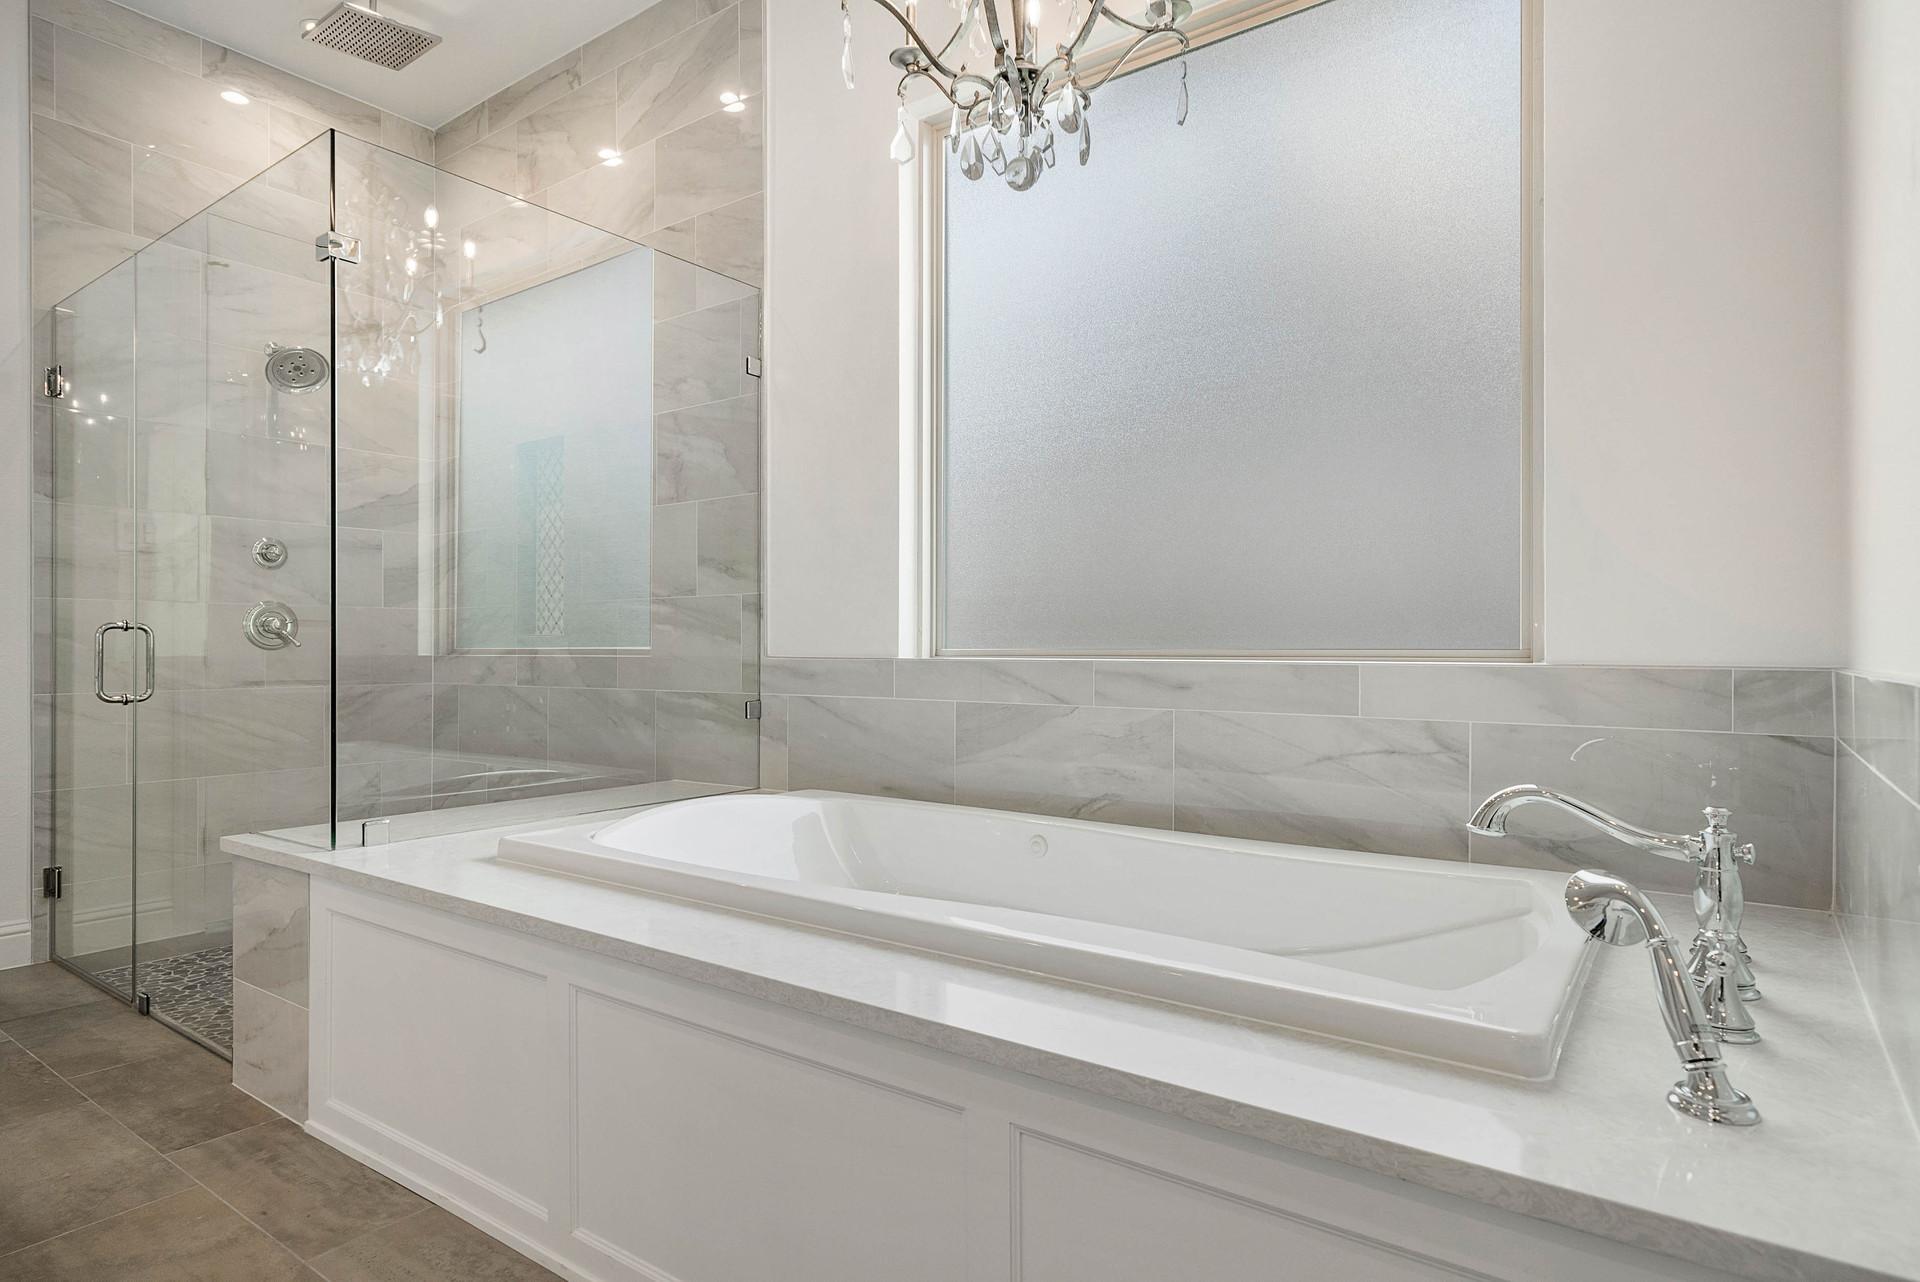 Master Bathroom Tub and Shower detail